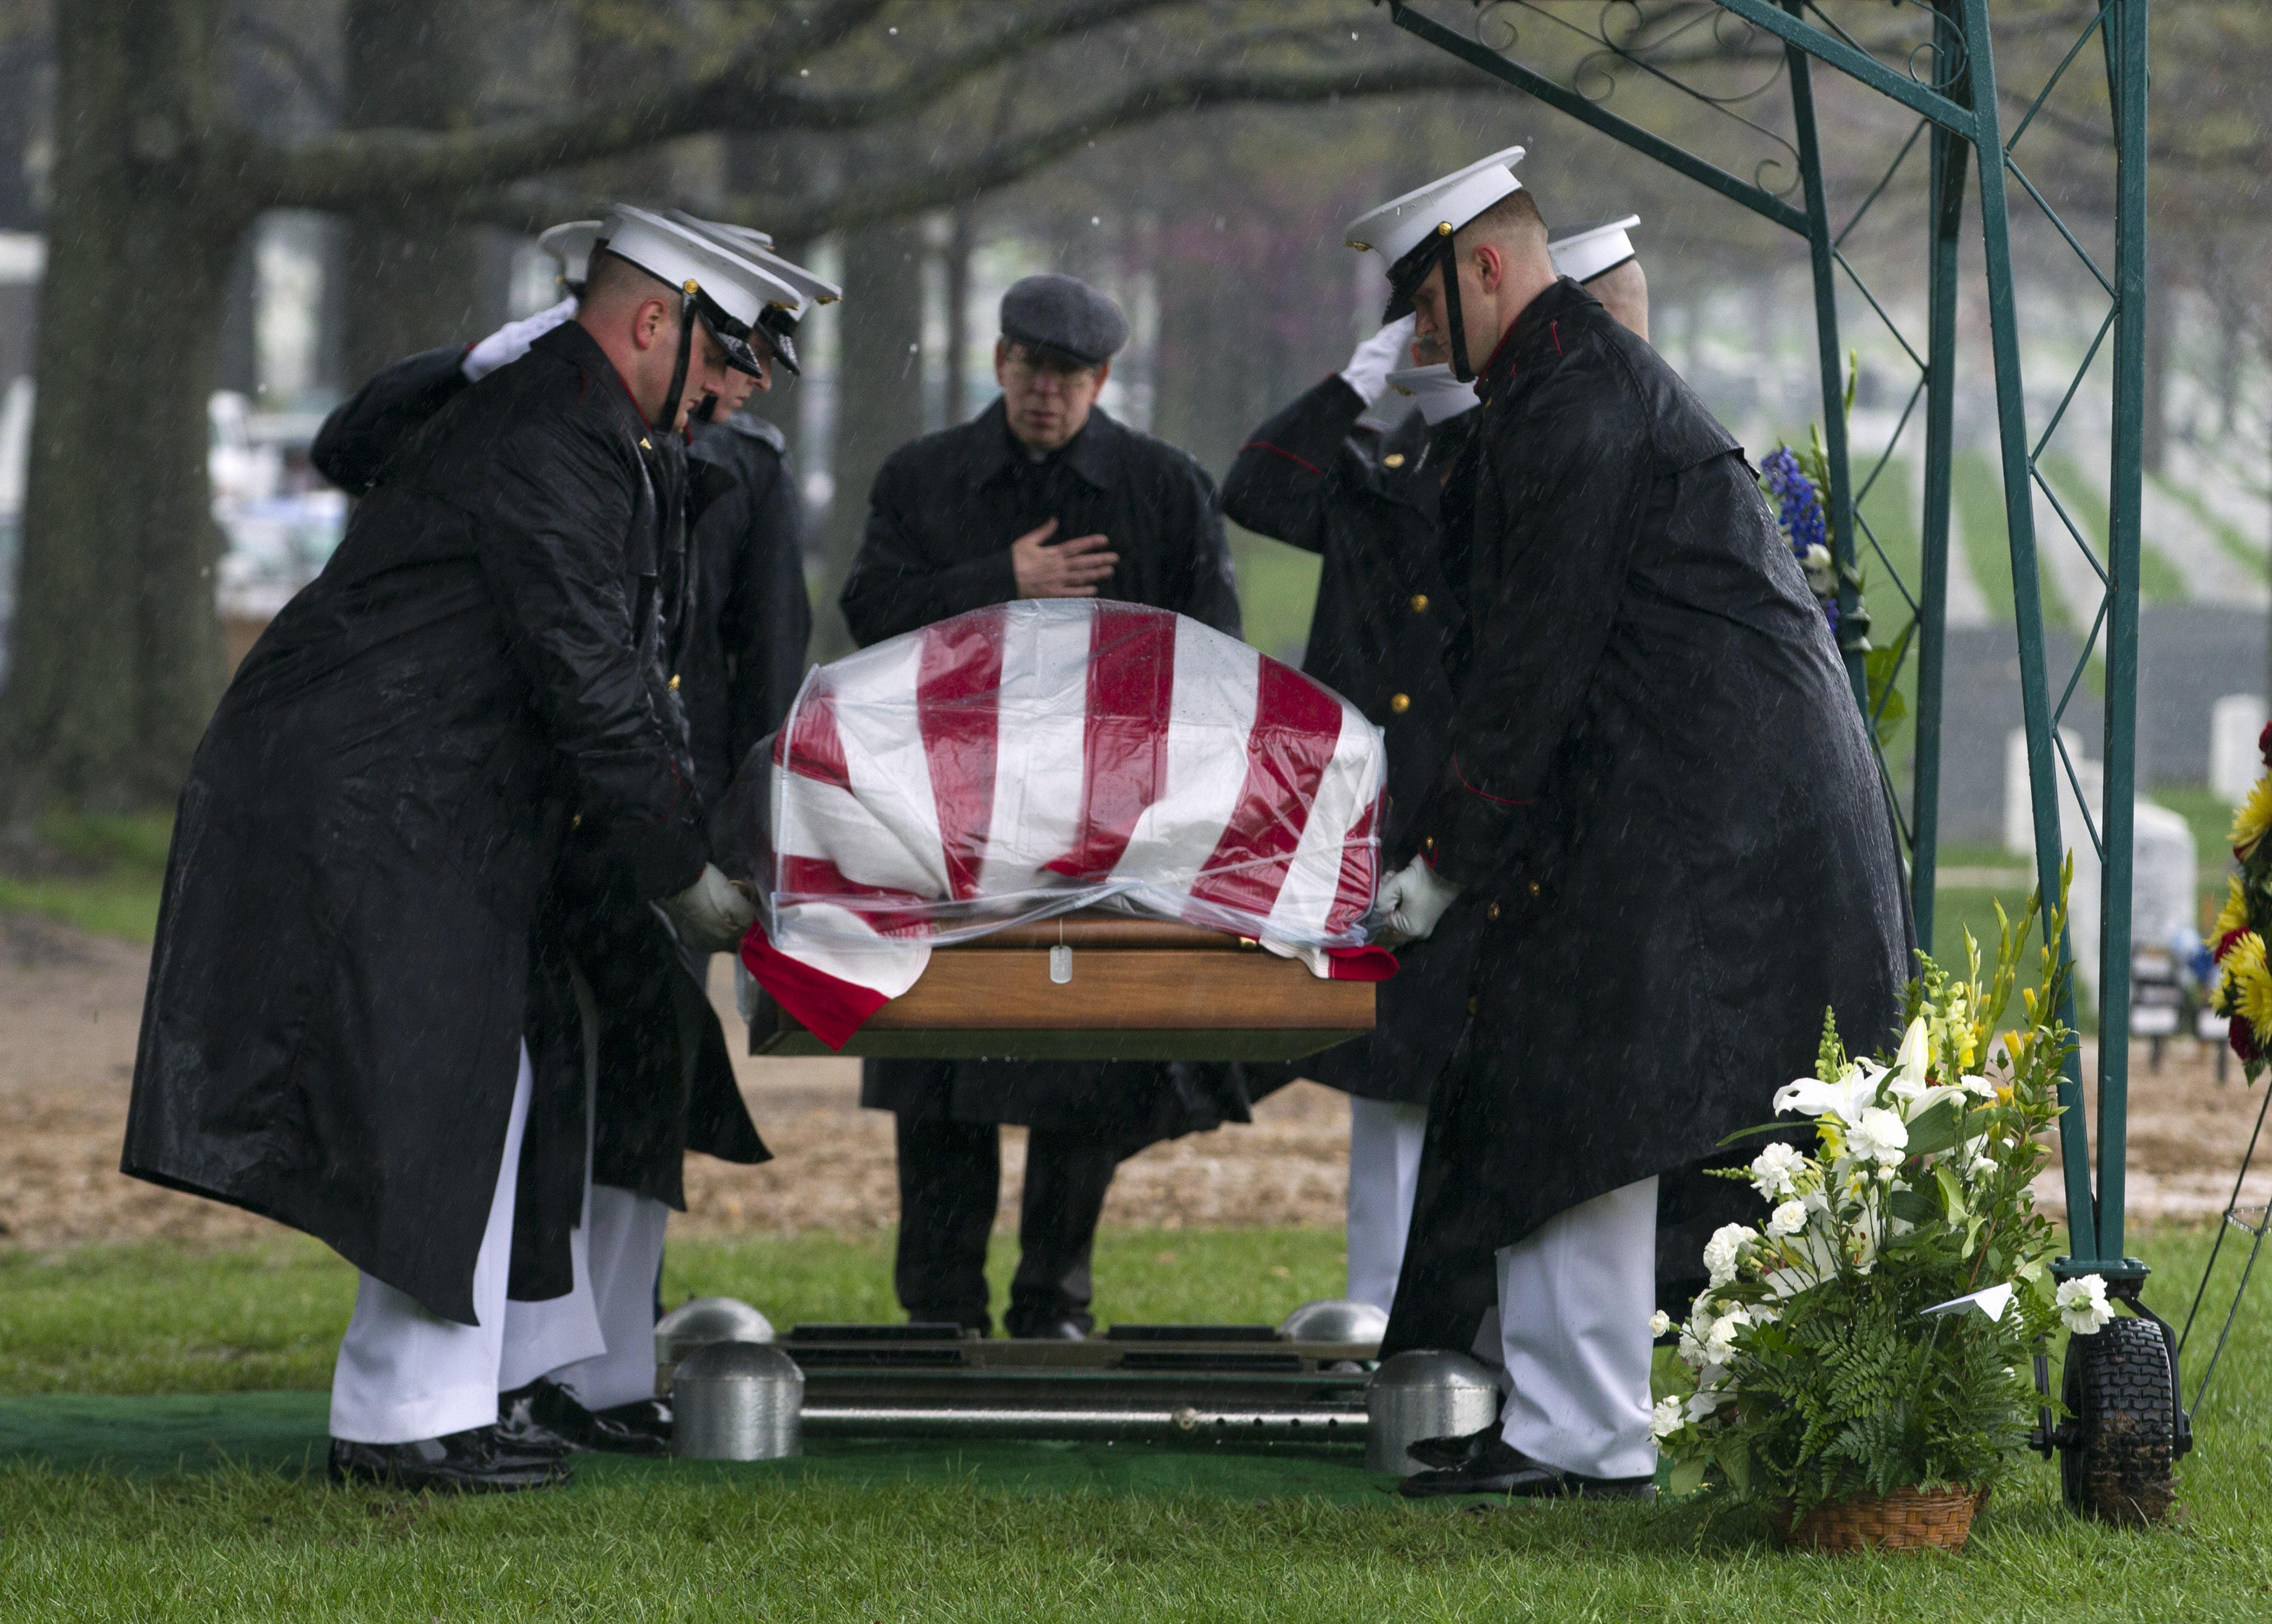 Bodies of three killed in December Japan crash identified, Marines say